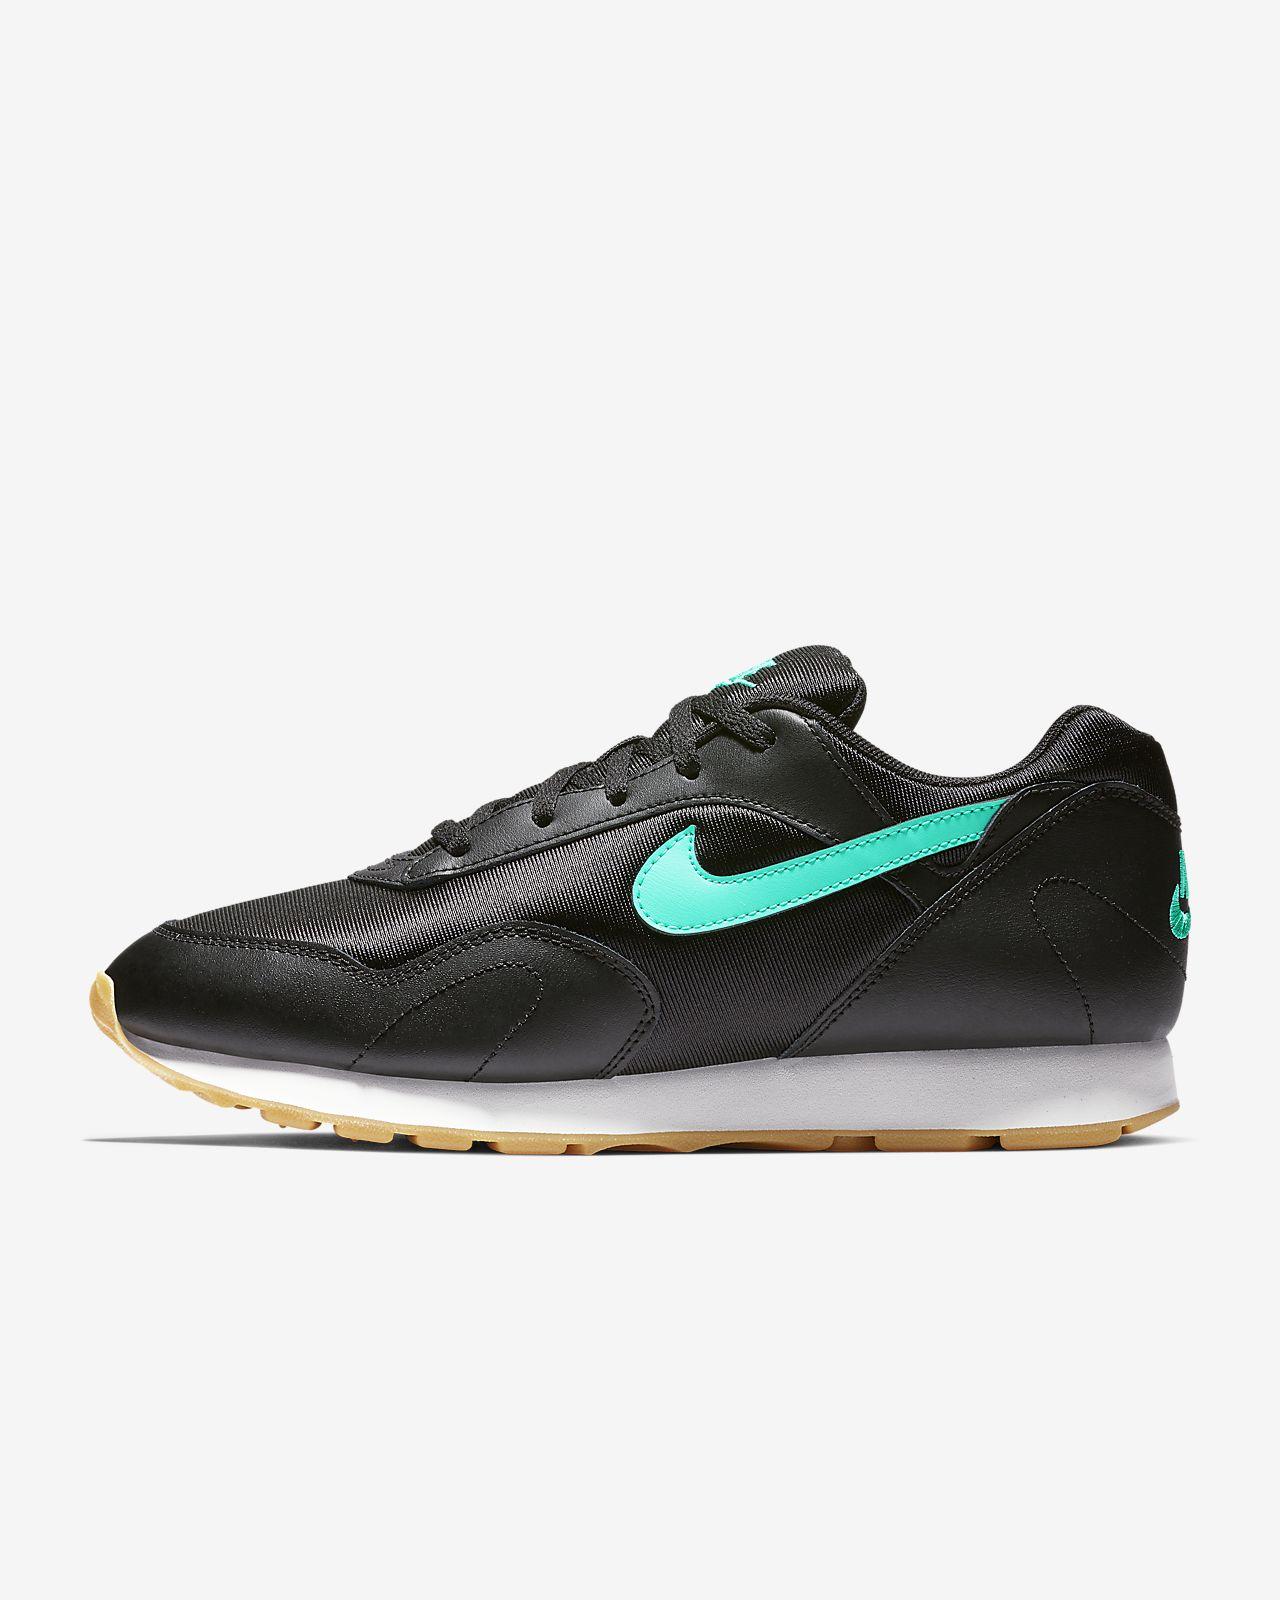 Chaussure Nike Outburst pour Femme